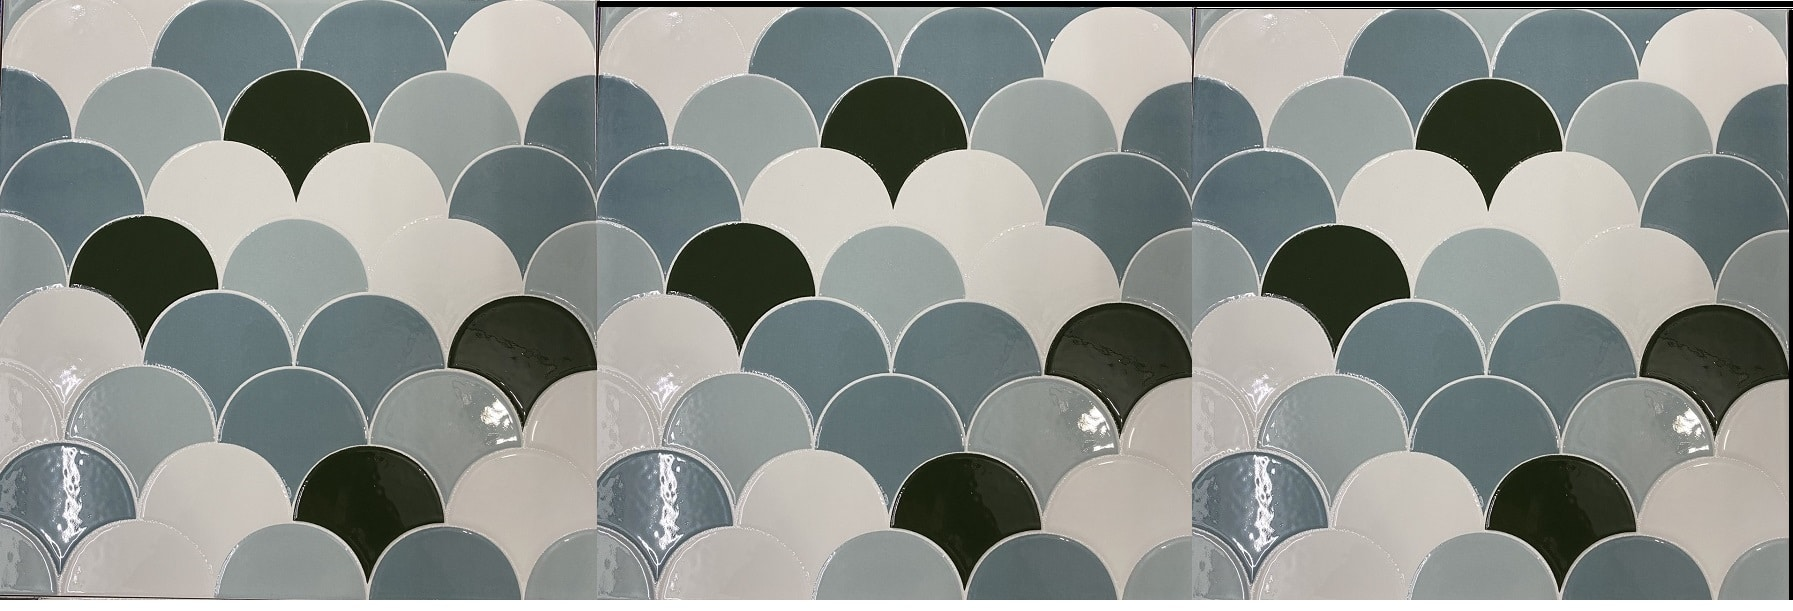 gach vay ca gia mosaic 3 mau trang xanh op bep phong ve sinh